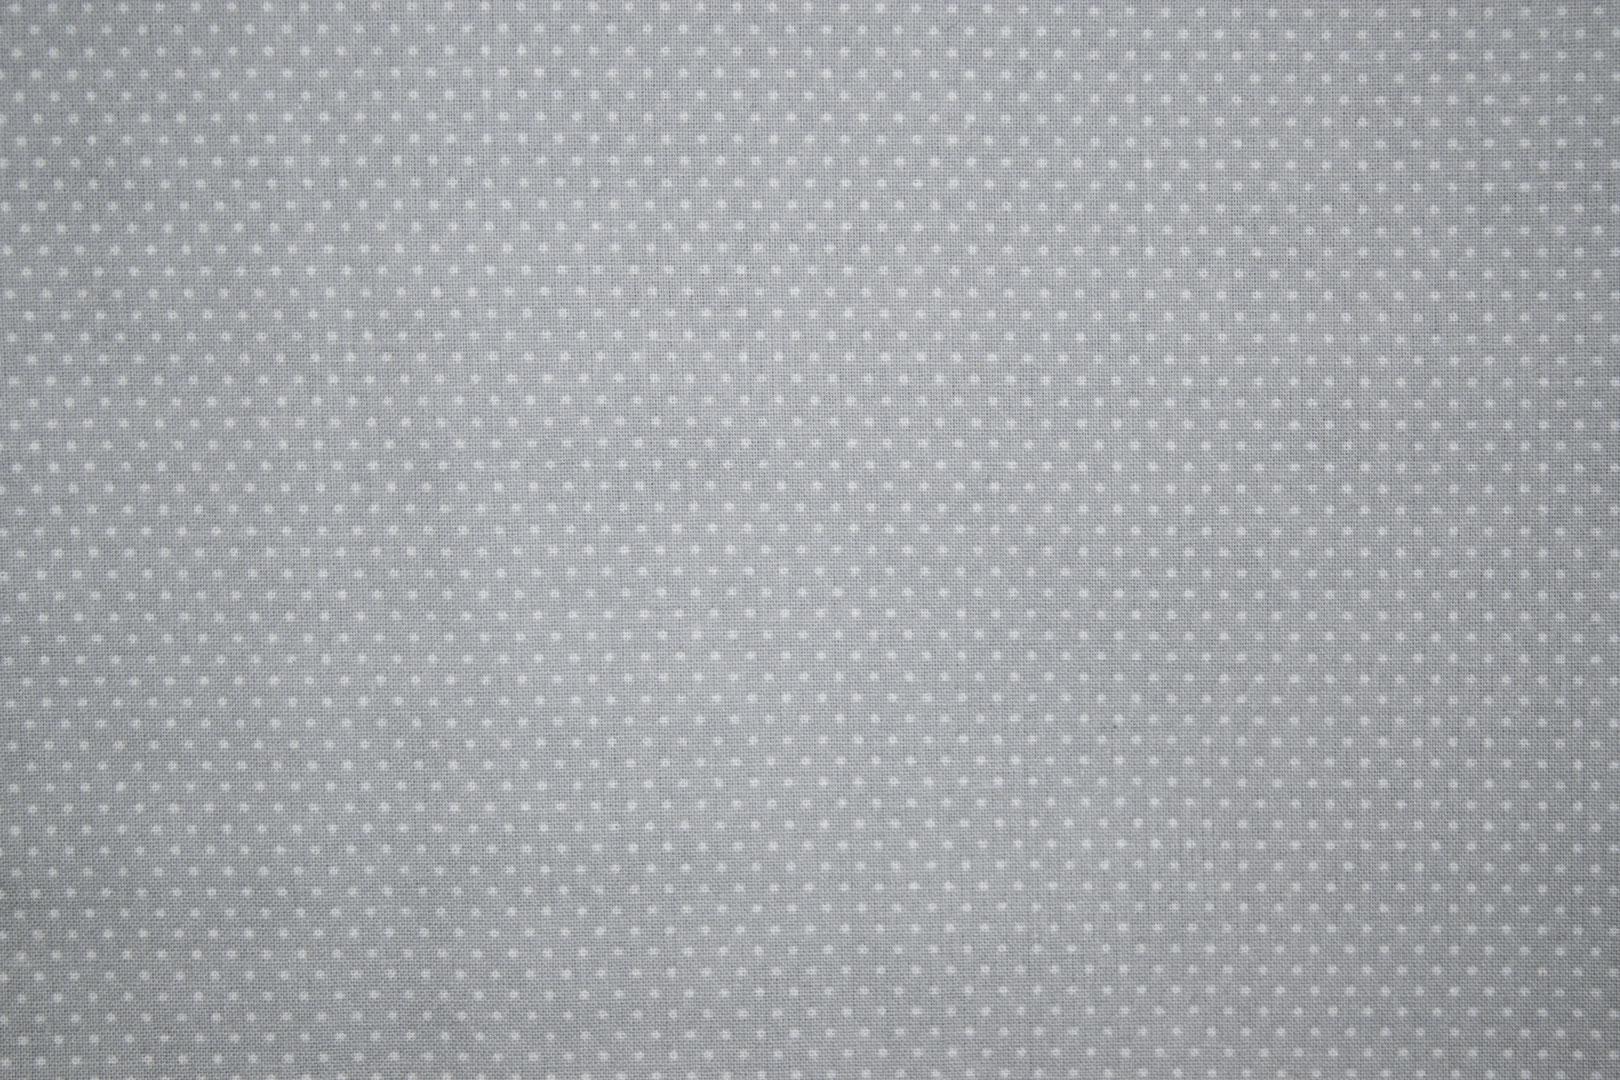 78_20707_gray